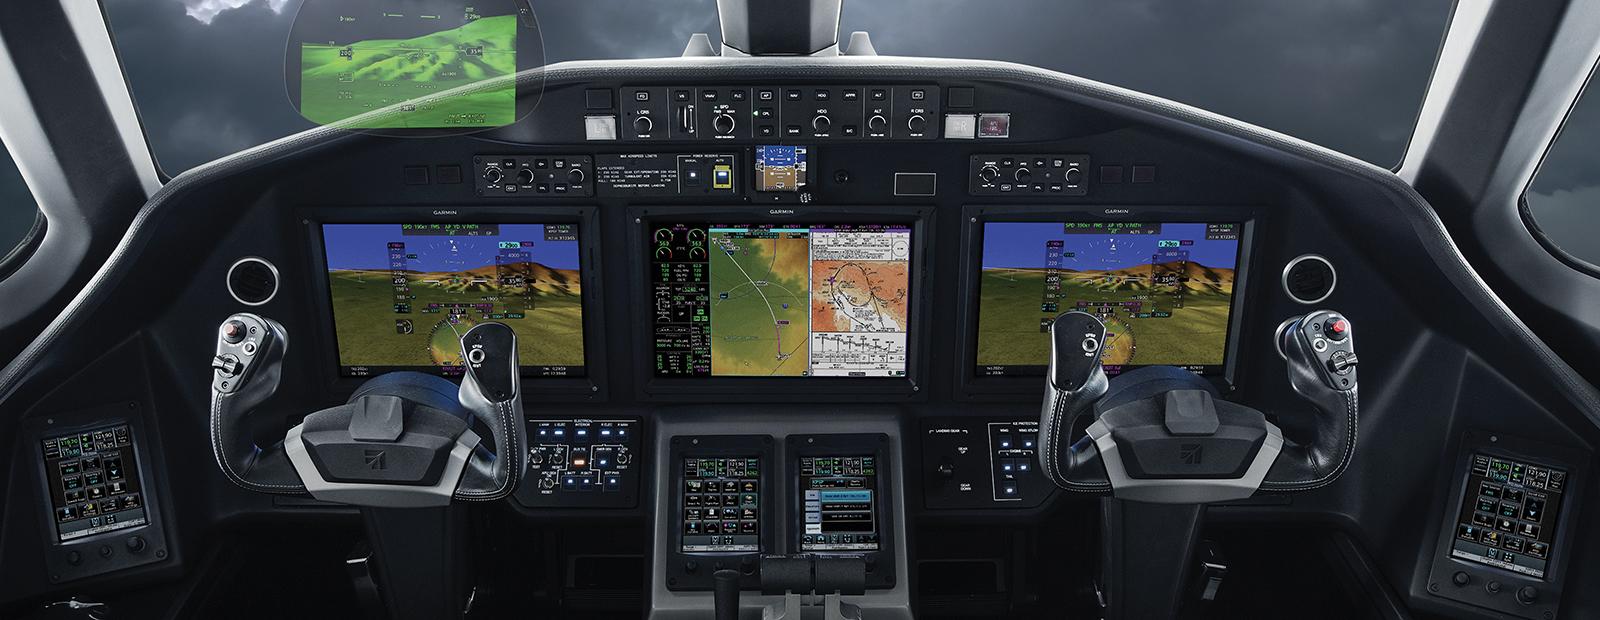 Flight Decks and Displays | Garmin